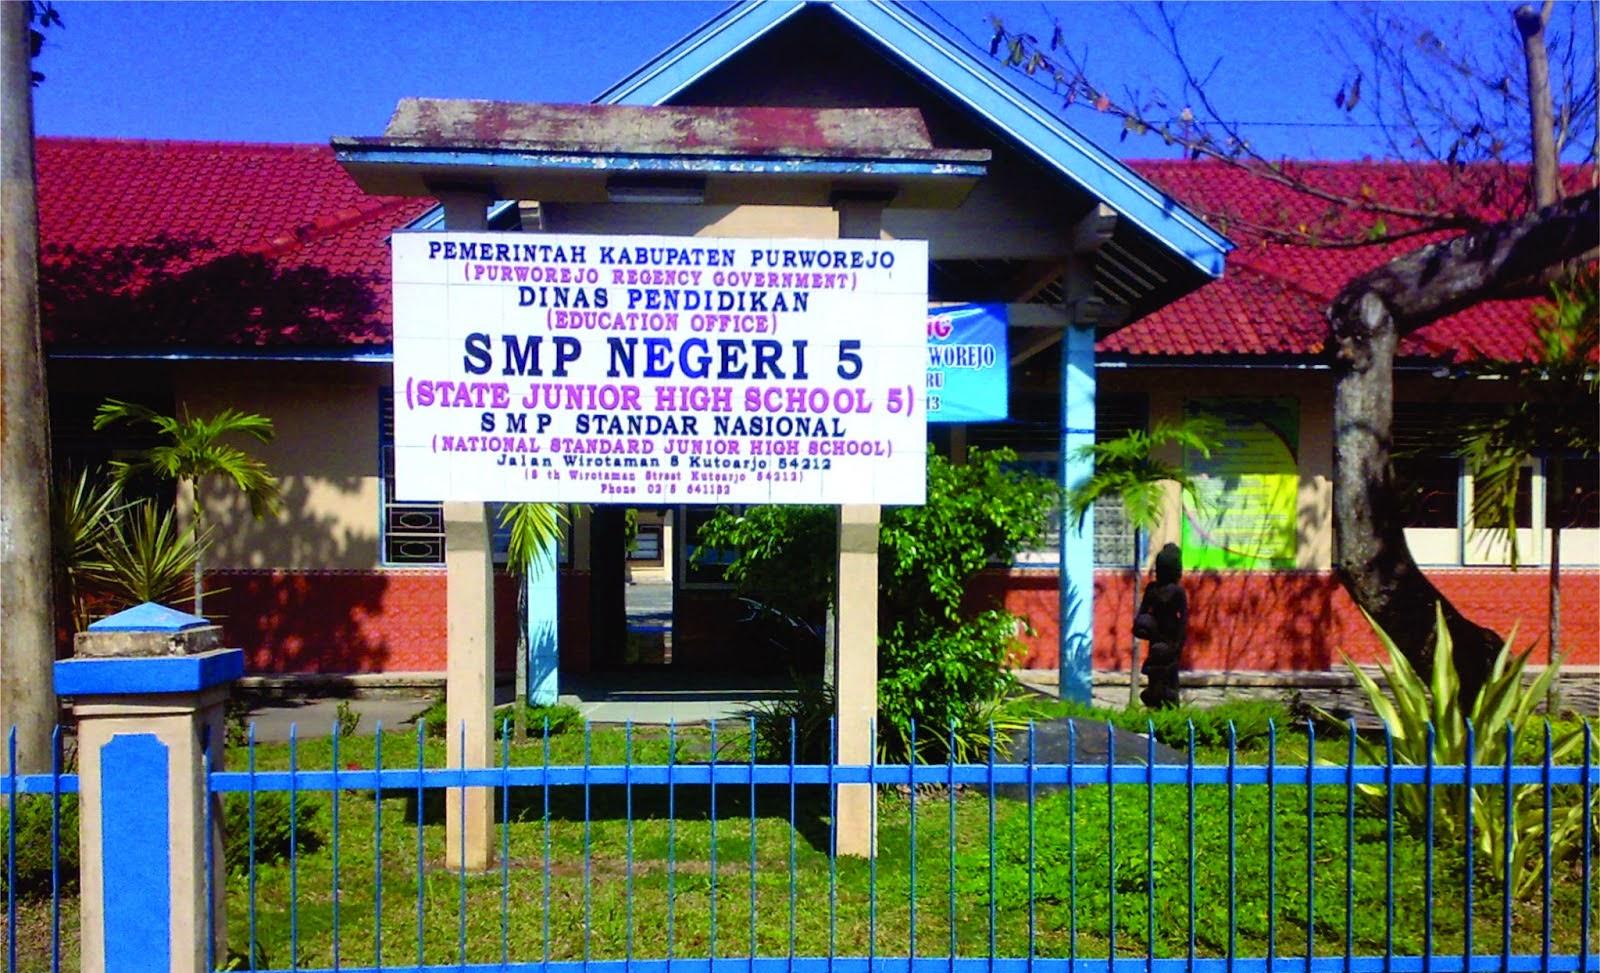 Sekolah Favorit Purworejo Wisatapurworejoblog Smpn 5 Berstandar Ssn Beralamat Jl